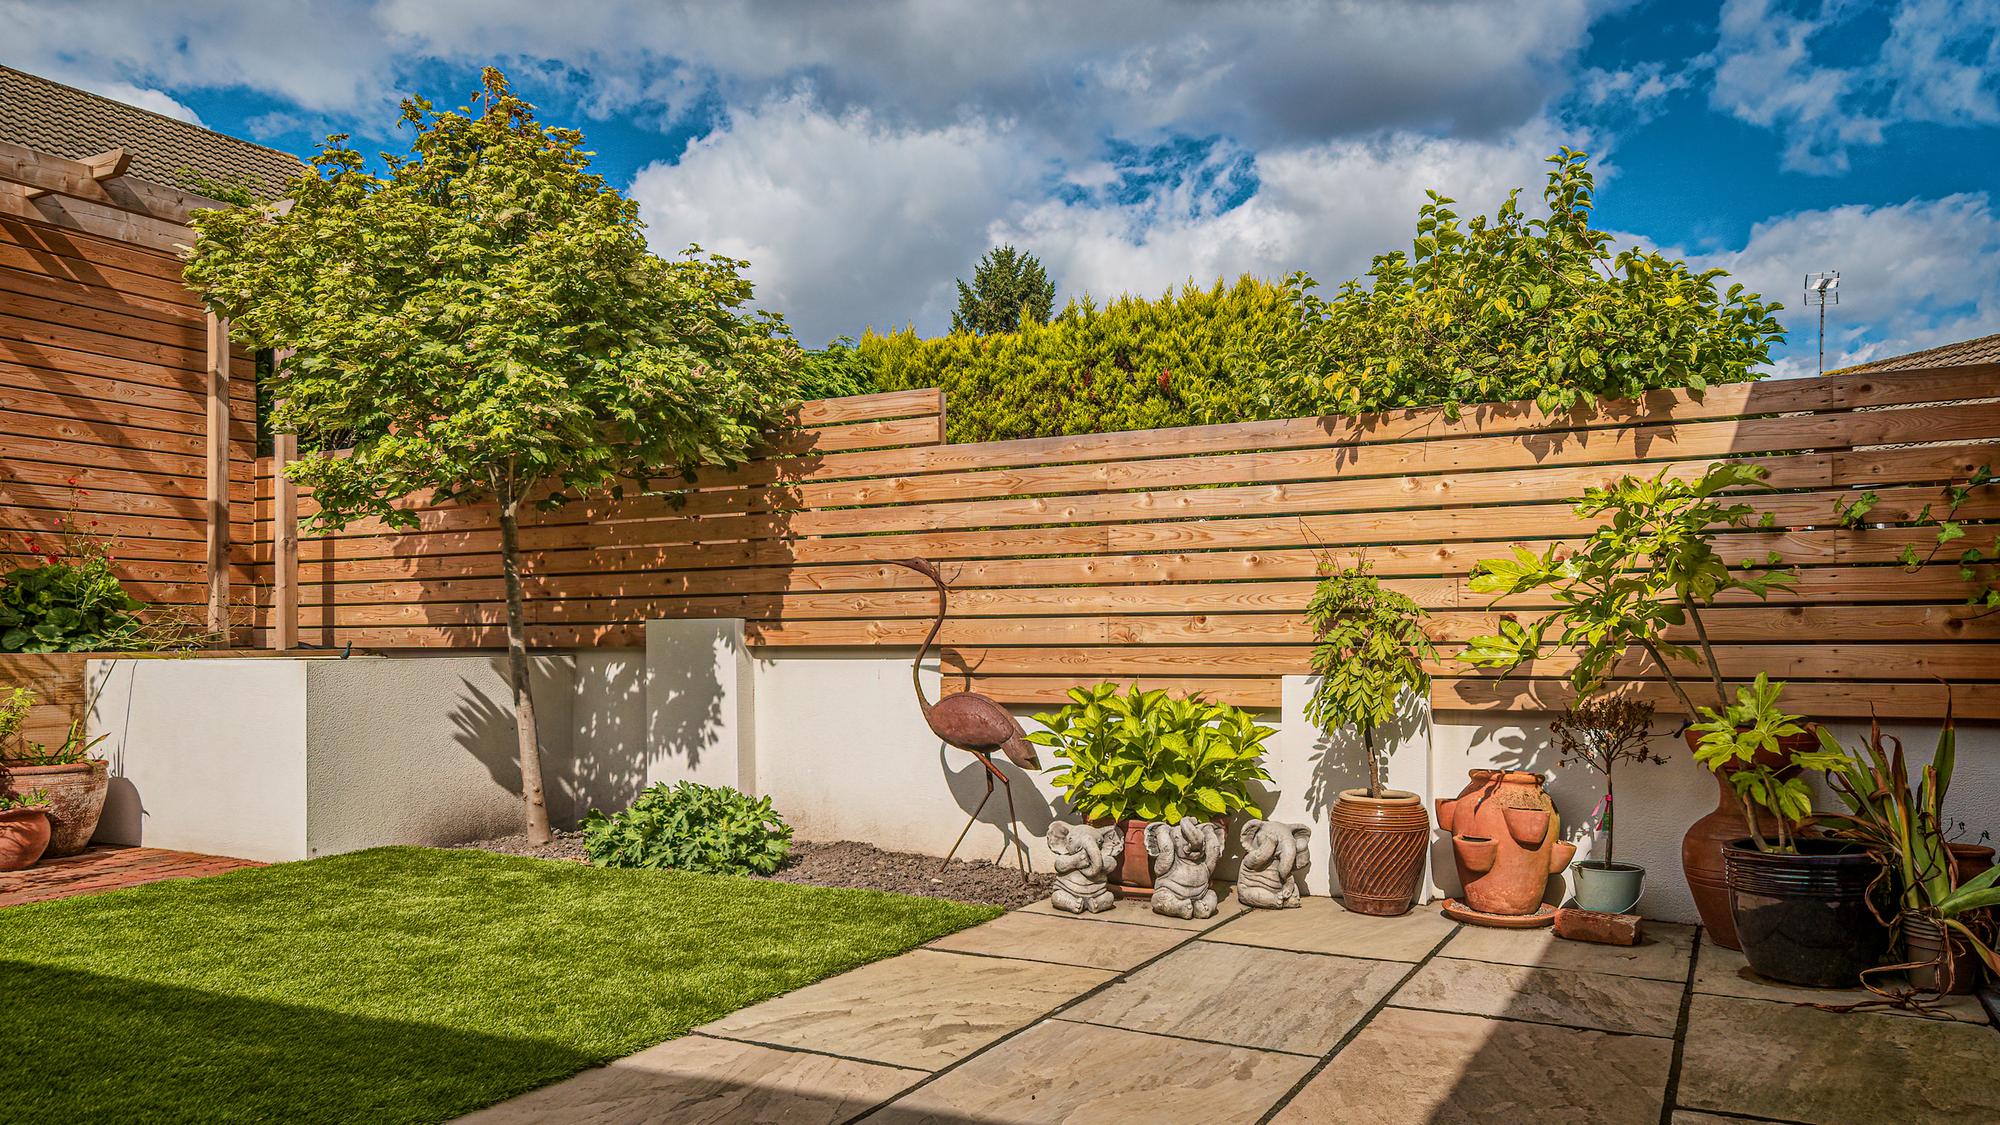 Completed Garden Landscape Design Raised Planter Outdoor Decor